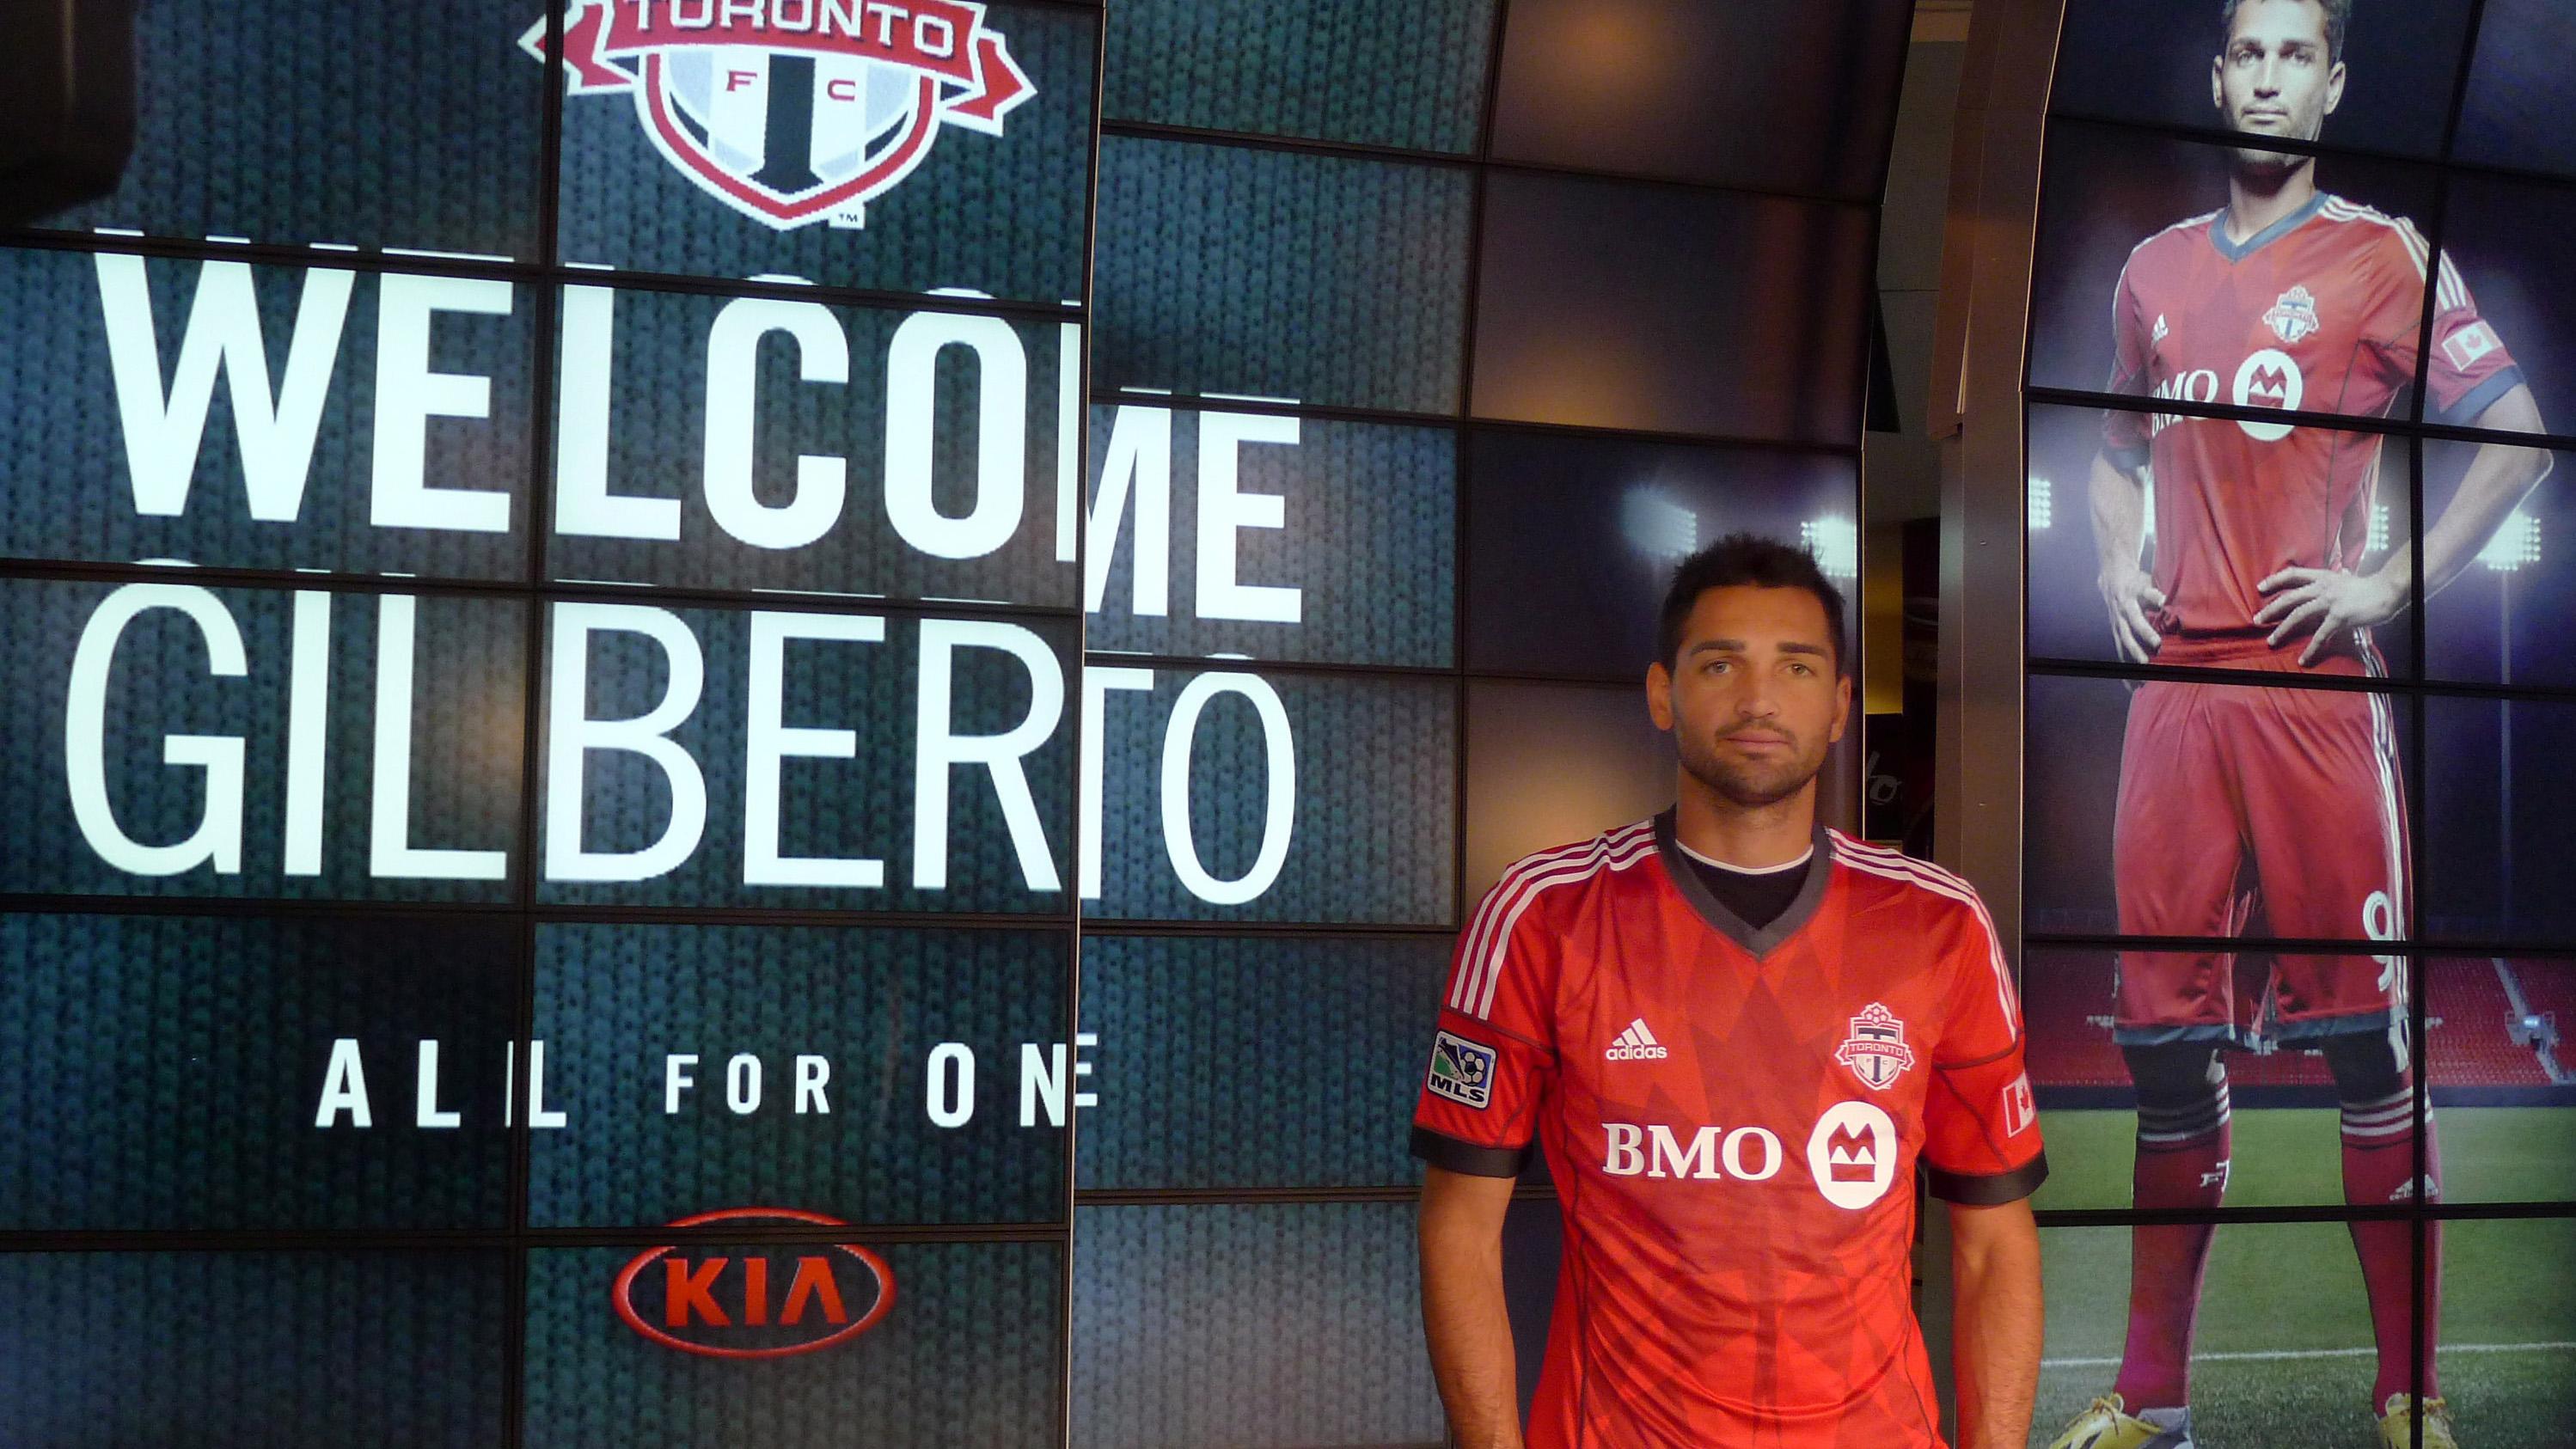 new product 21229 d5136 Toronto FC lands Brazilian striker Gilberto - Sportsnet.ca